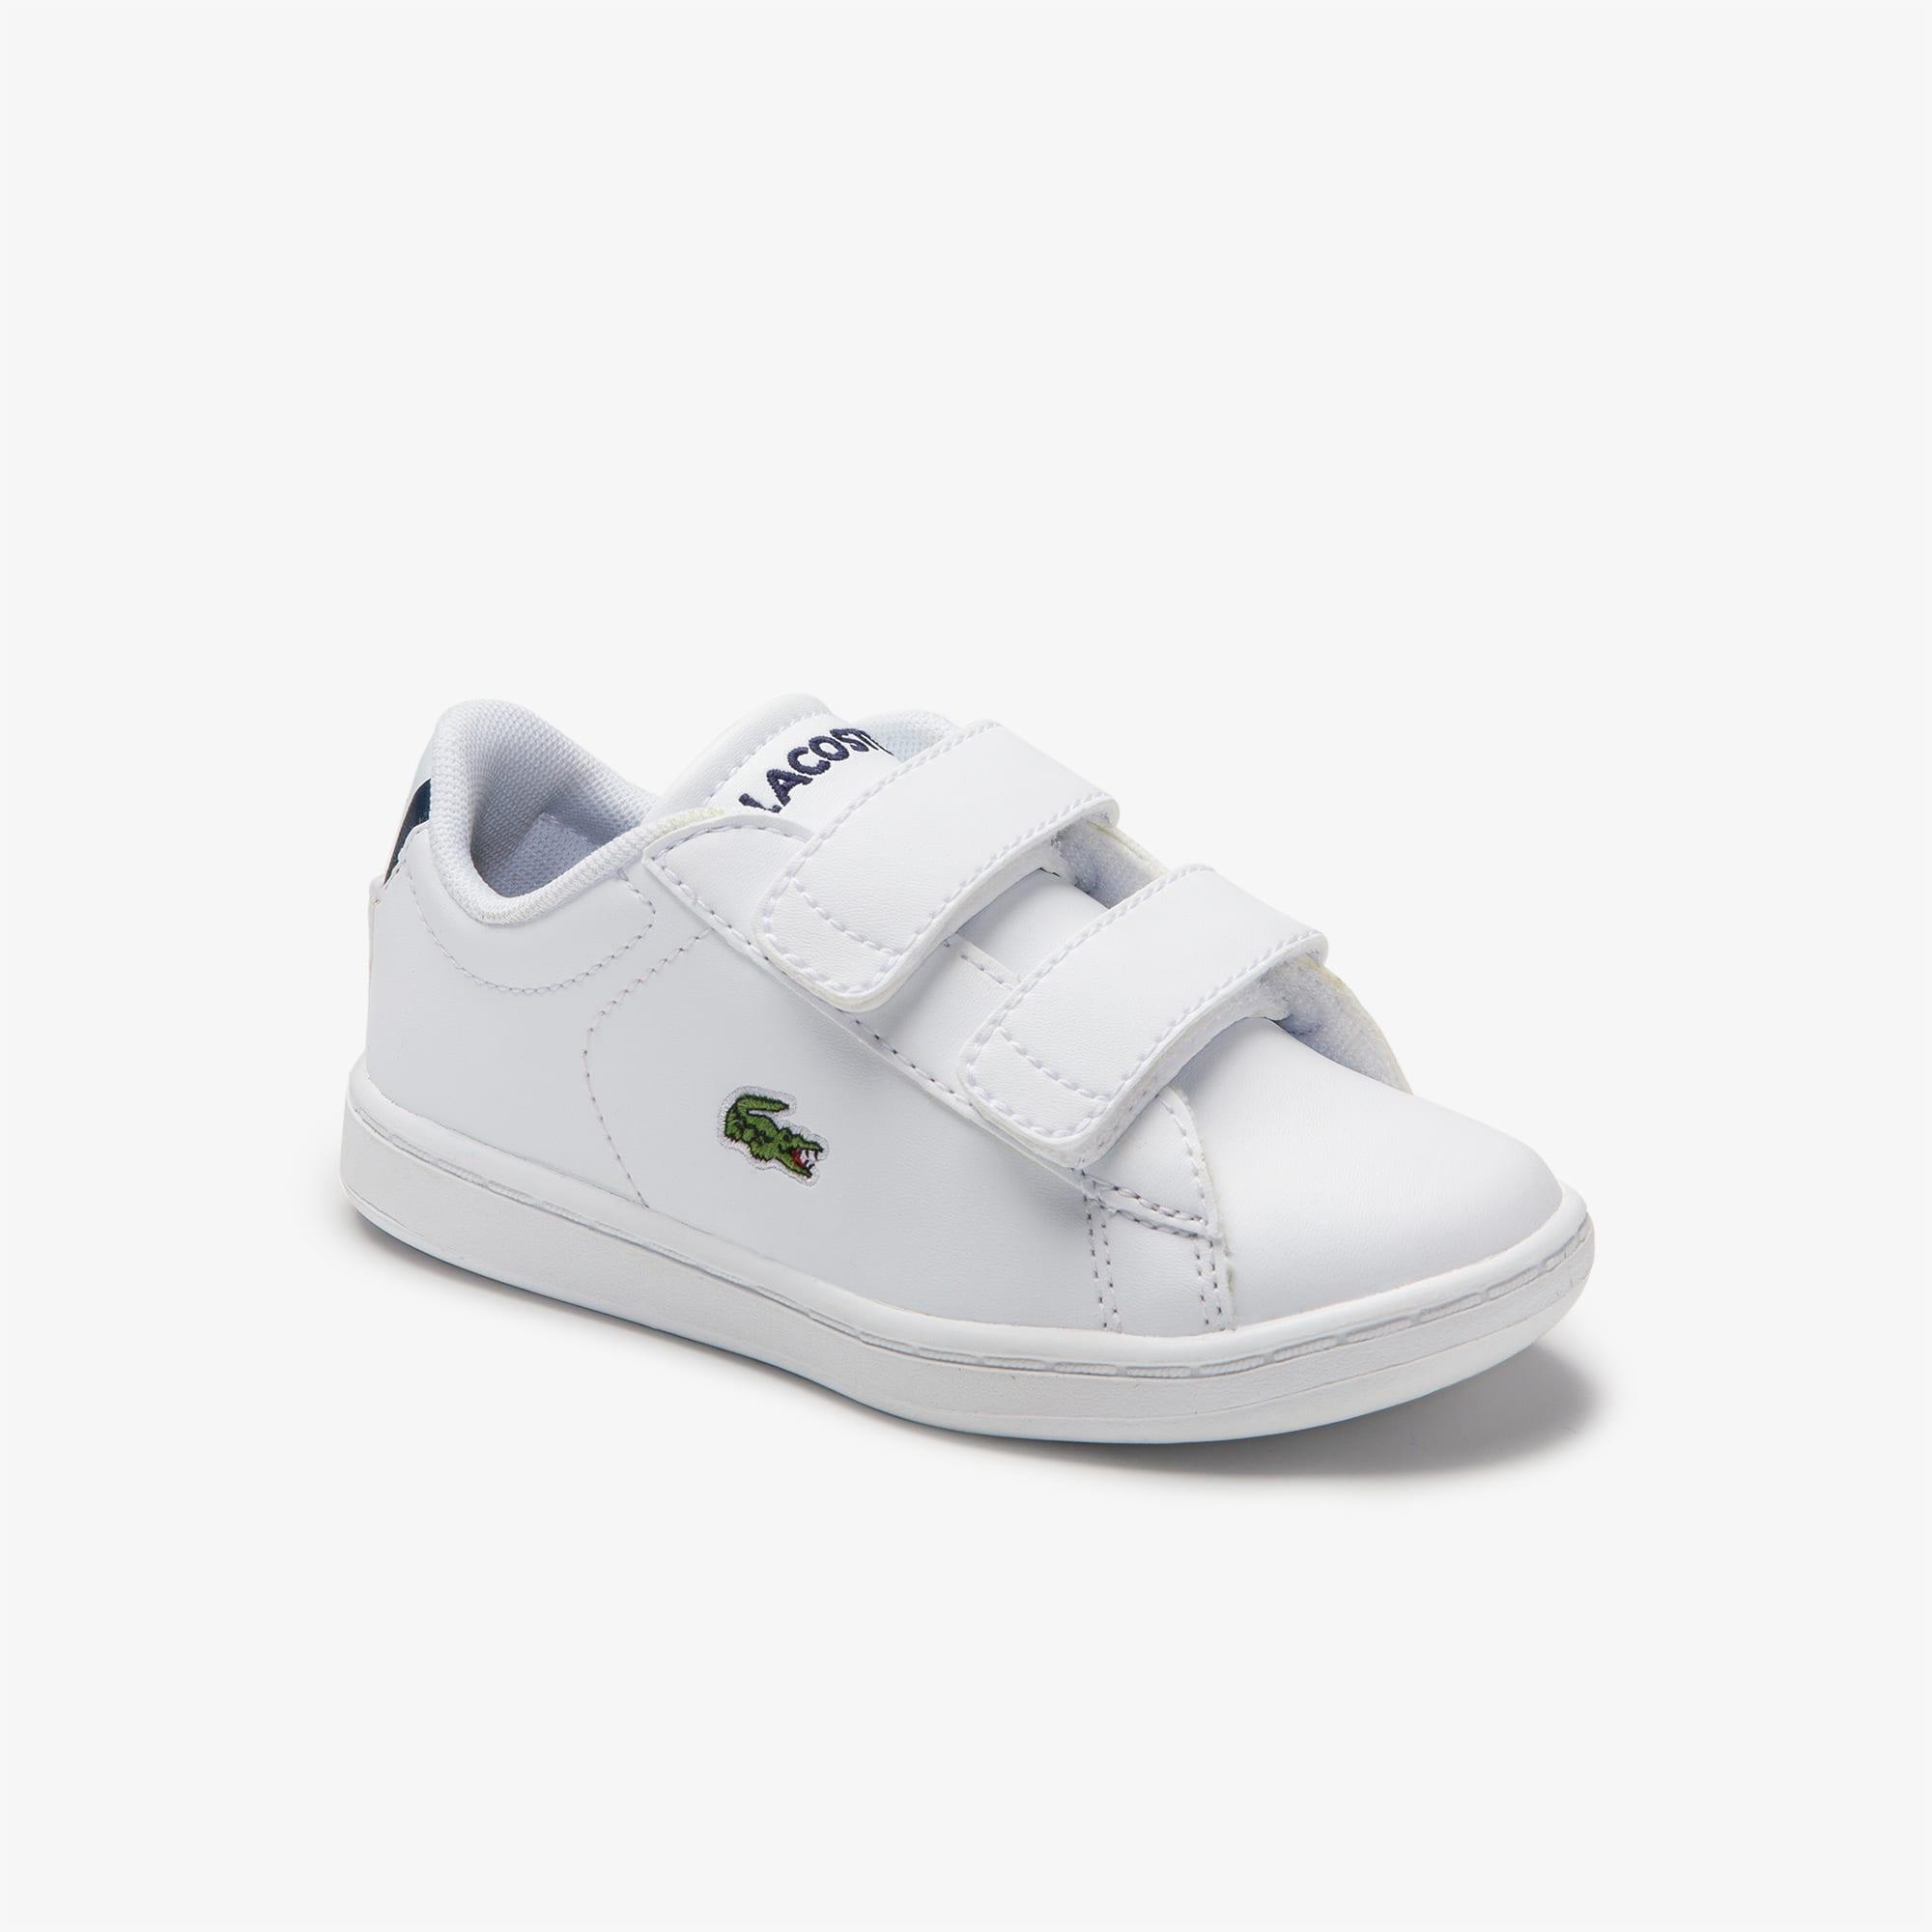 Zapatillas Niño Carnaby Evo Bl 1 Velcro